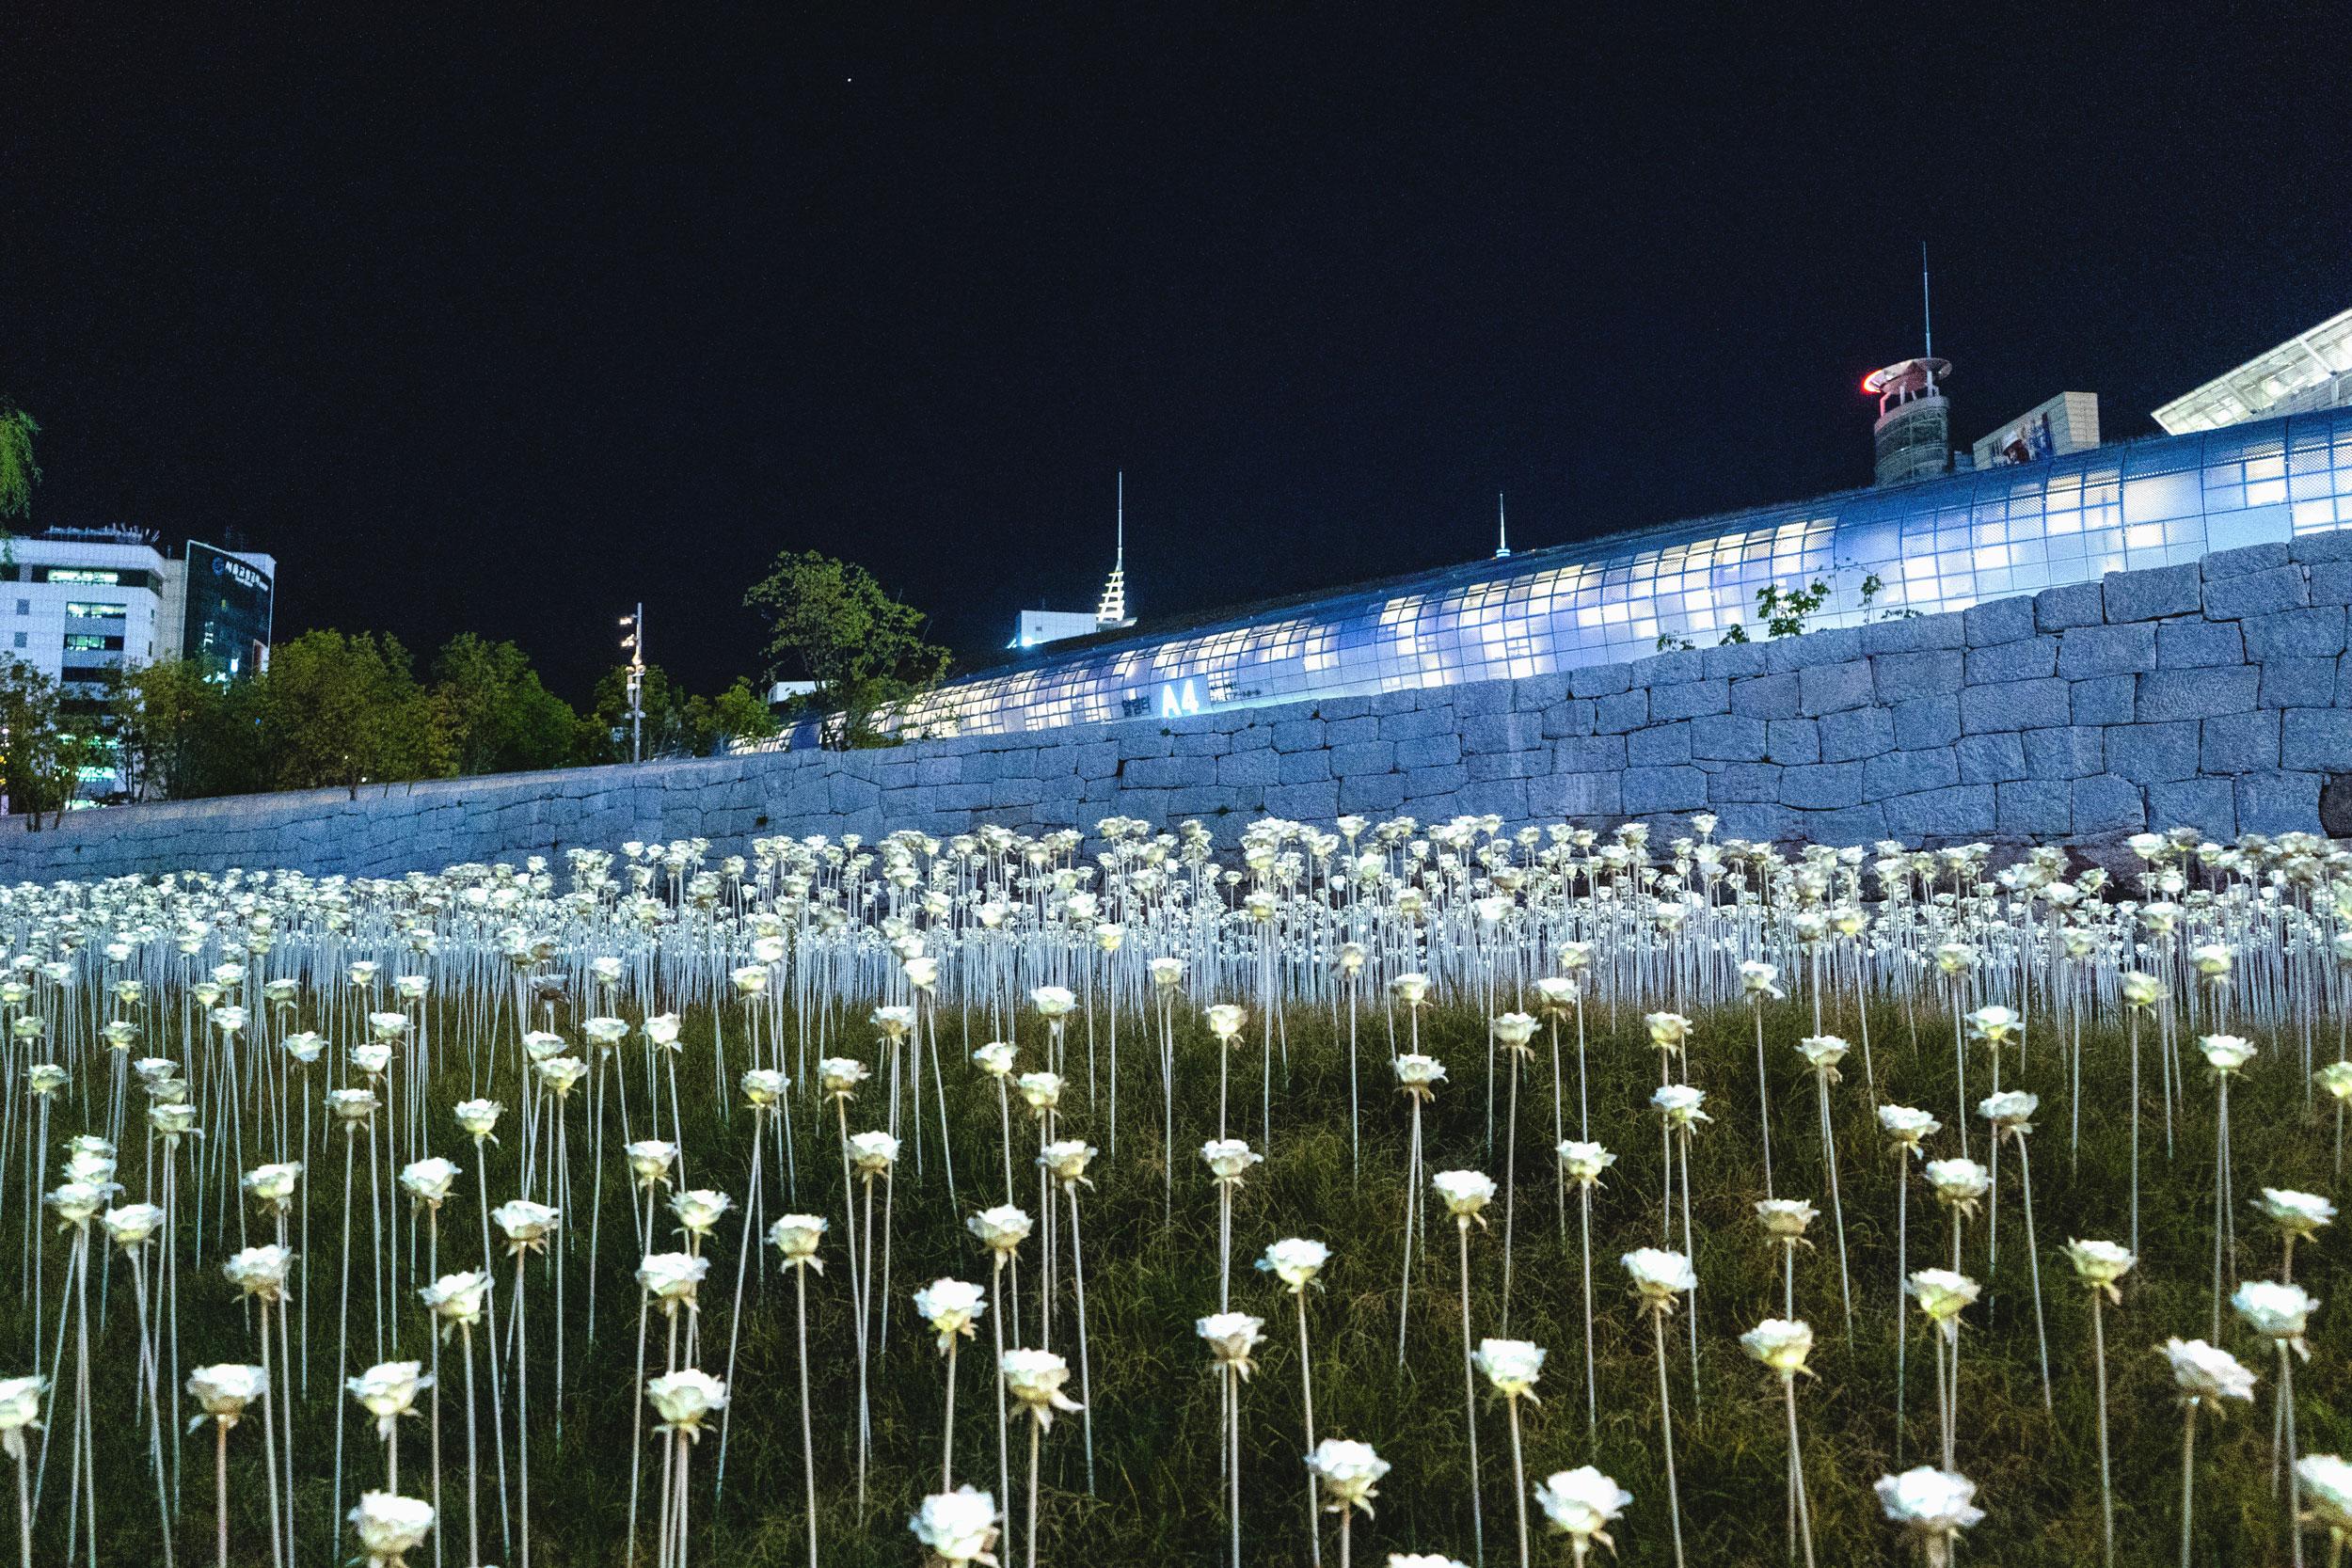 Illuminated rose garden at Dongdaemun Design Plaza (DDP)